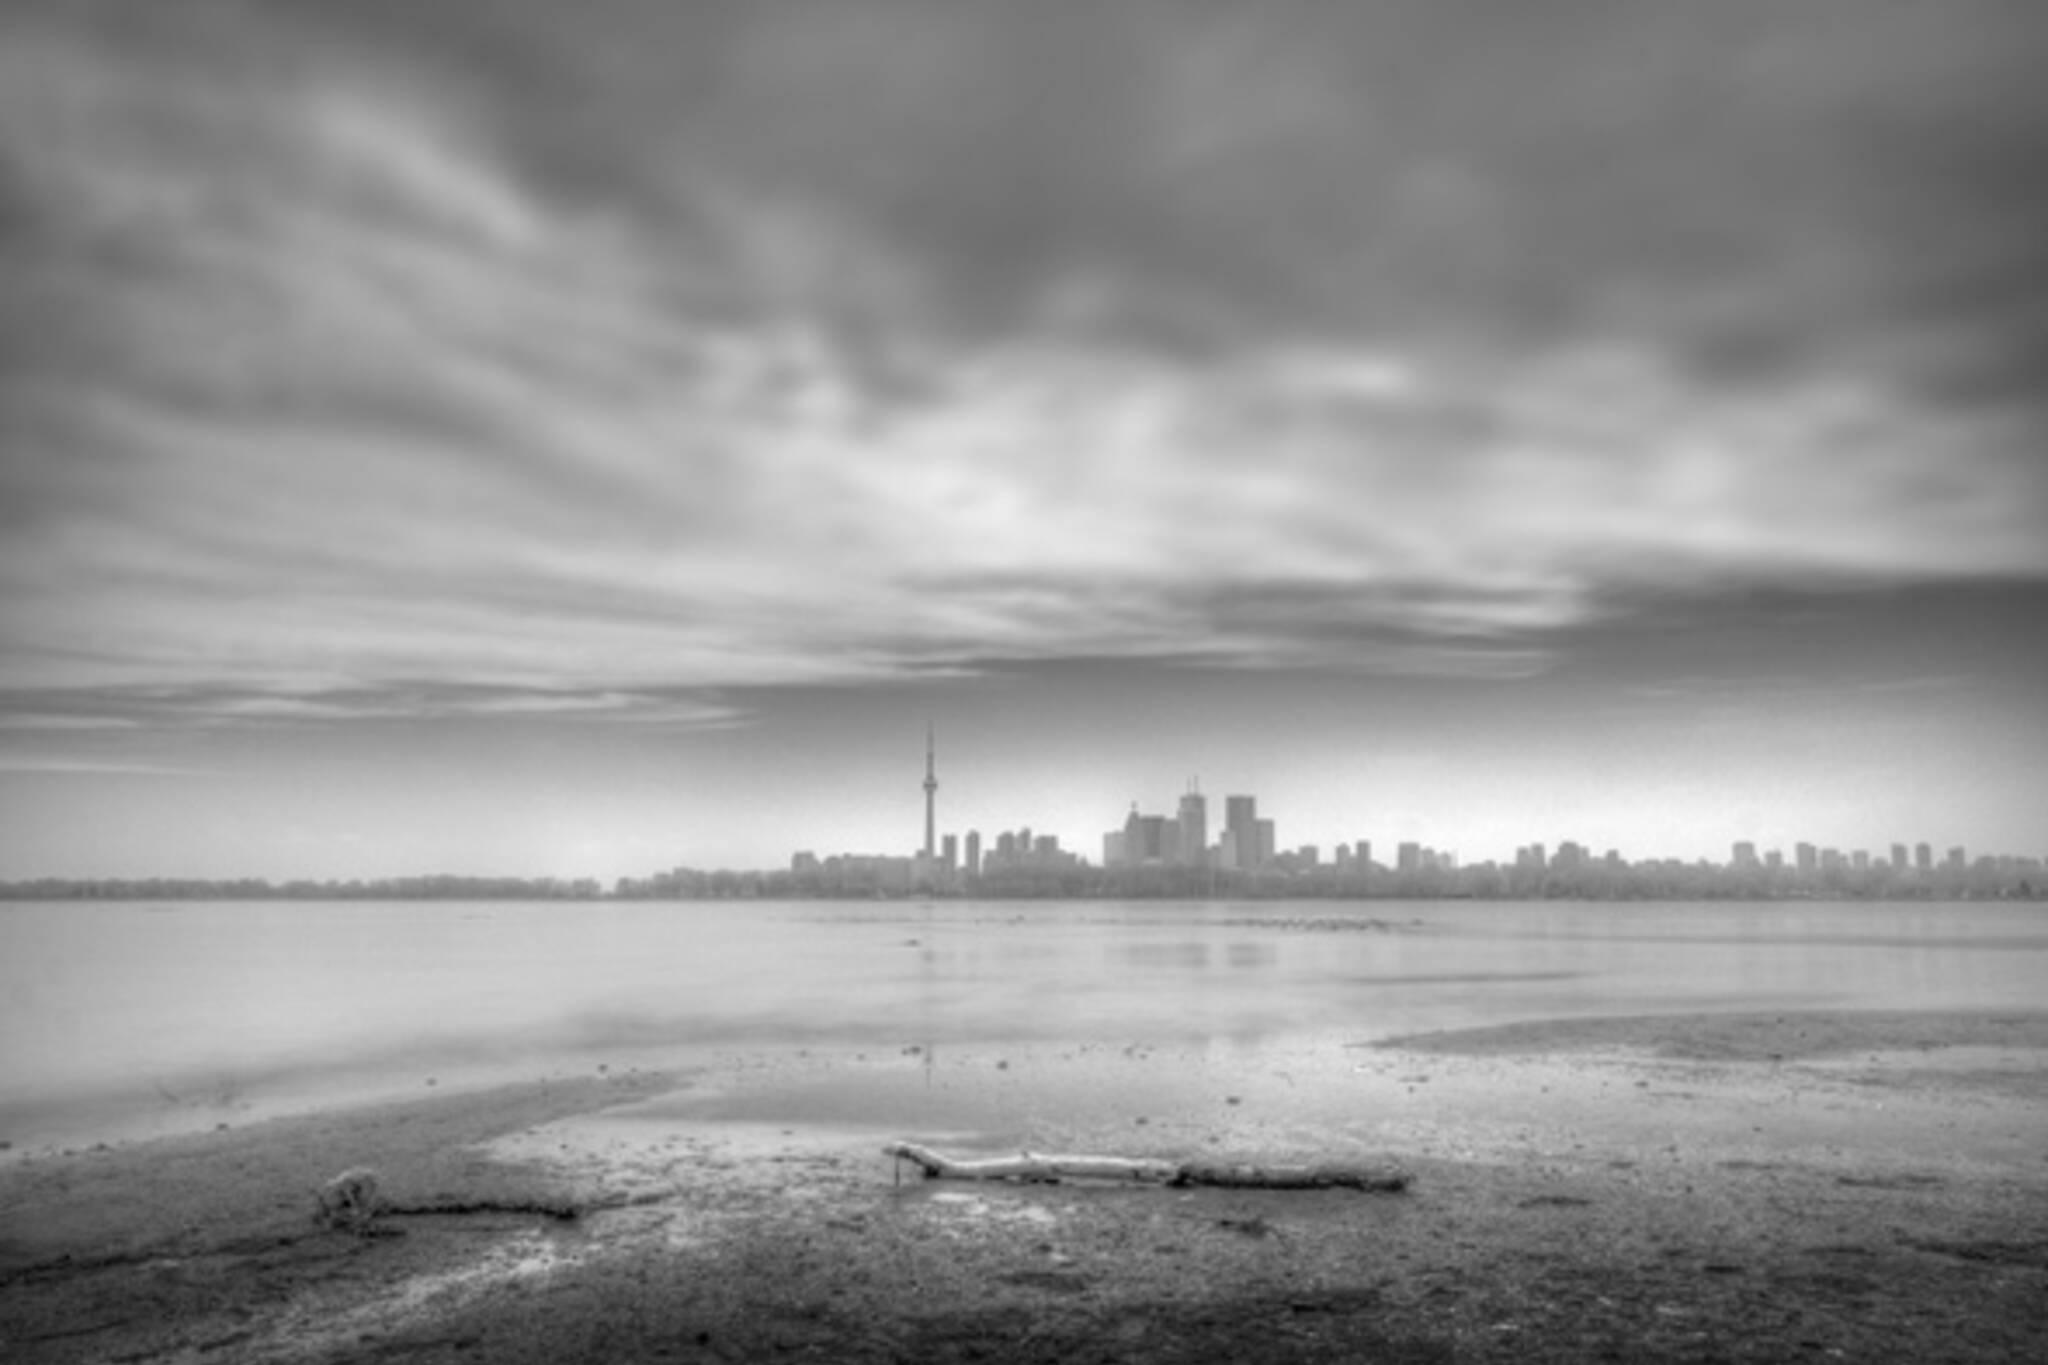 Toronto skyline black and white